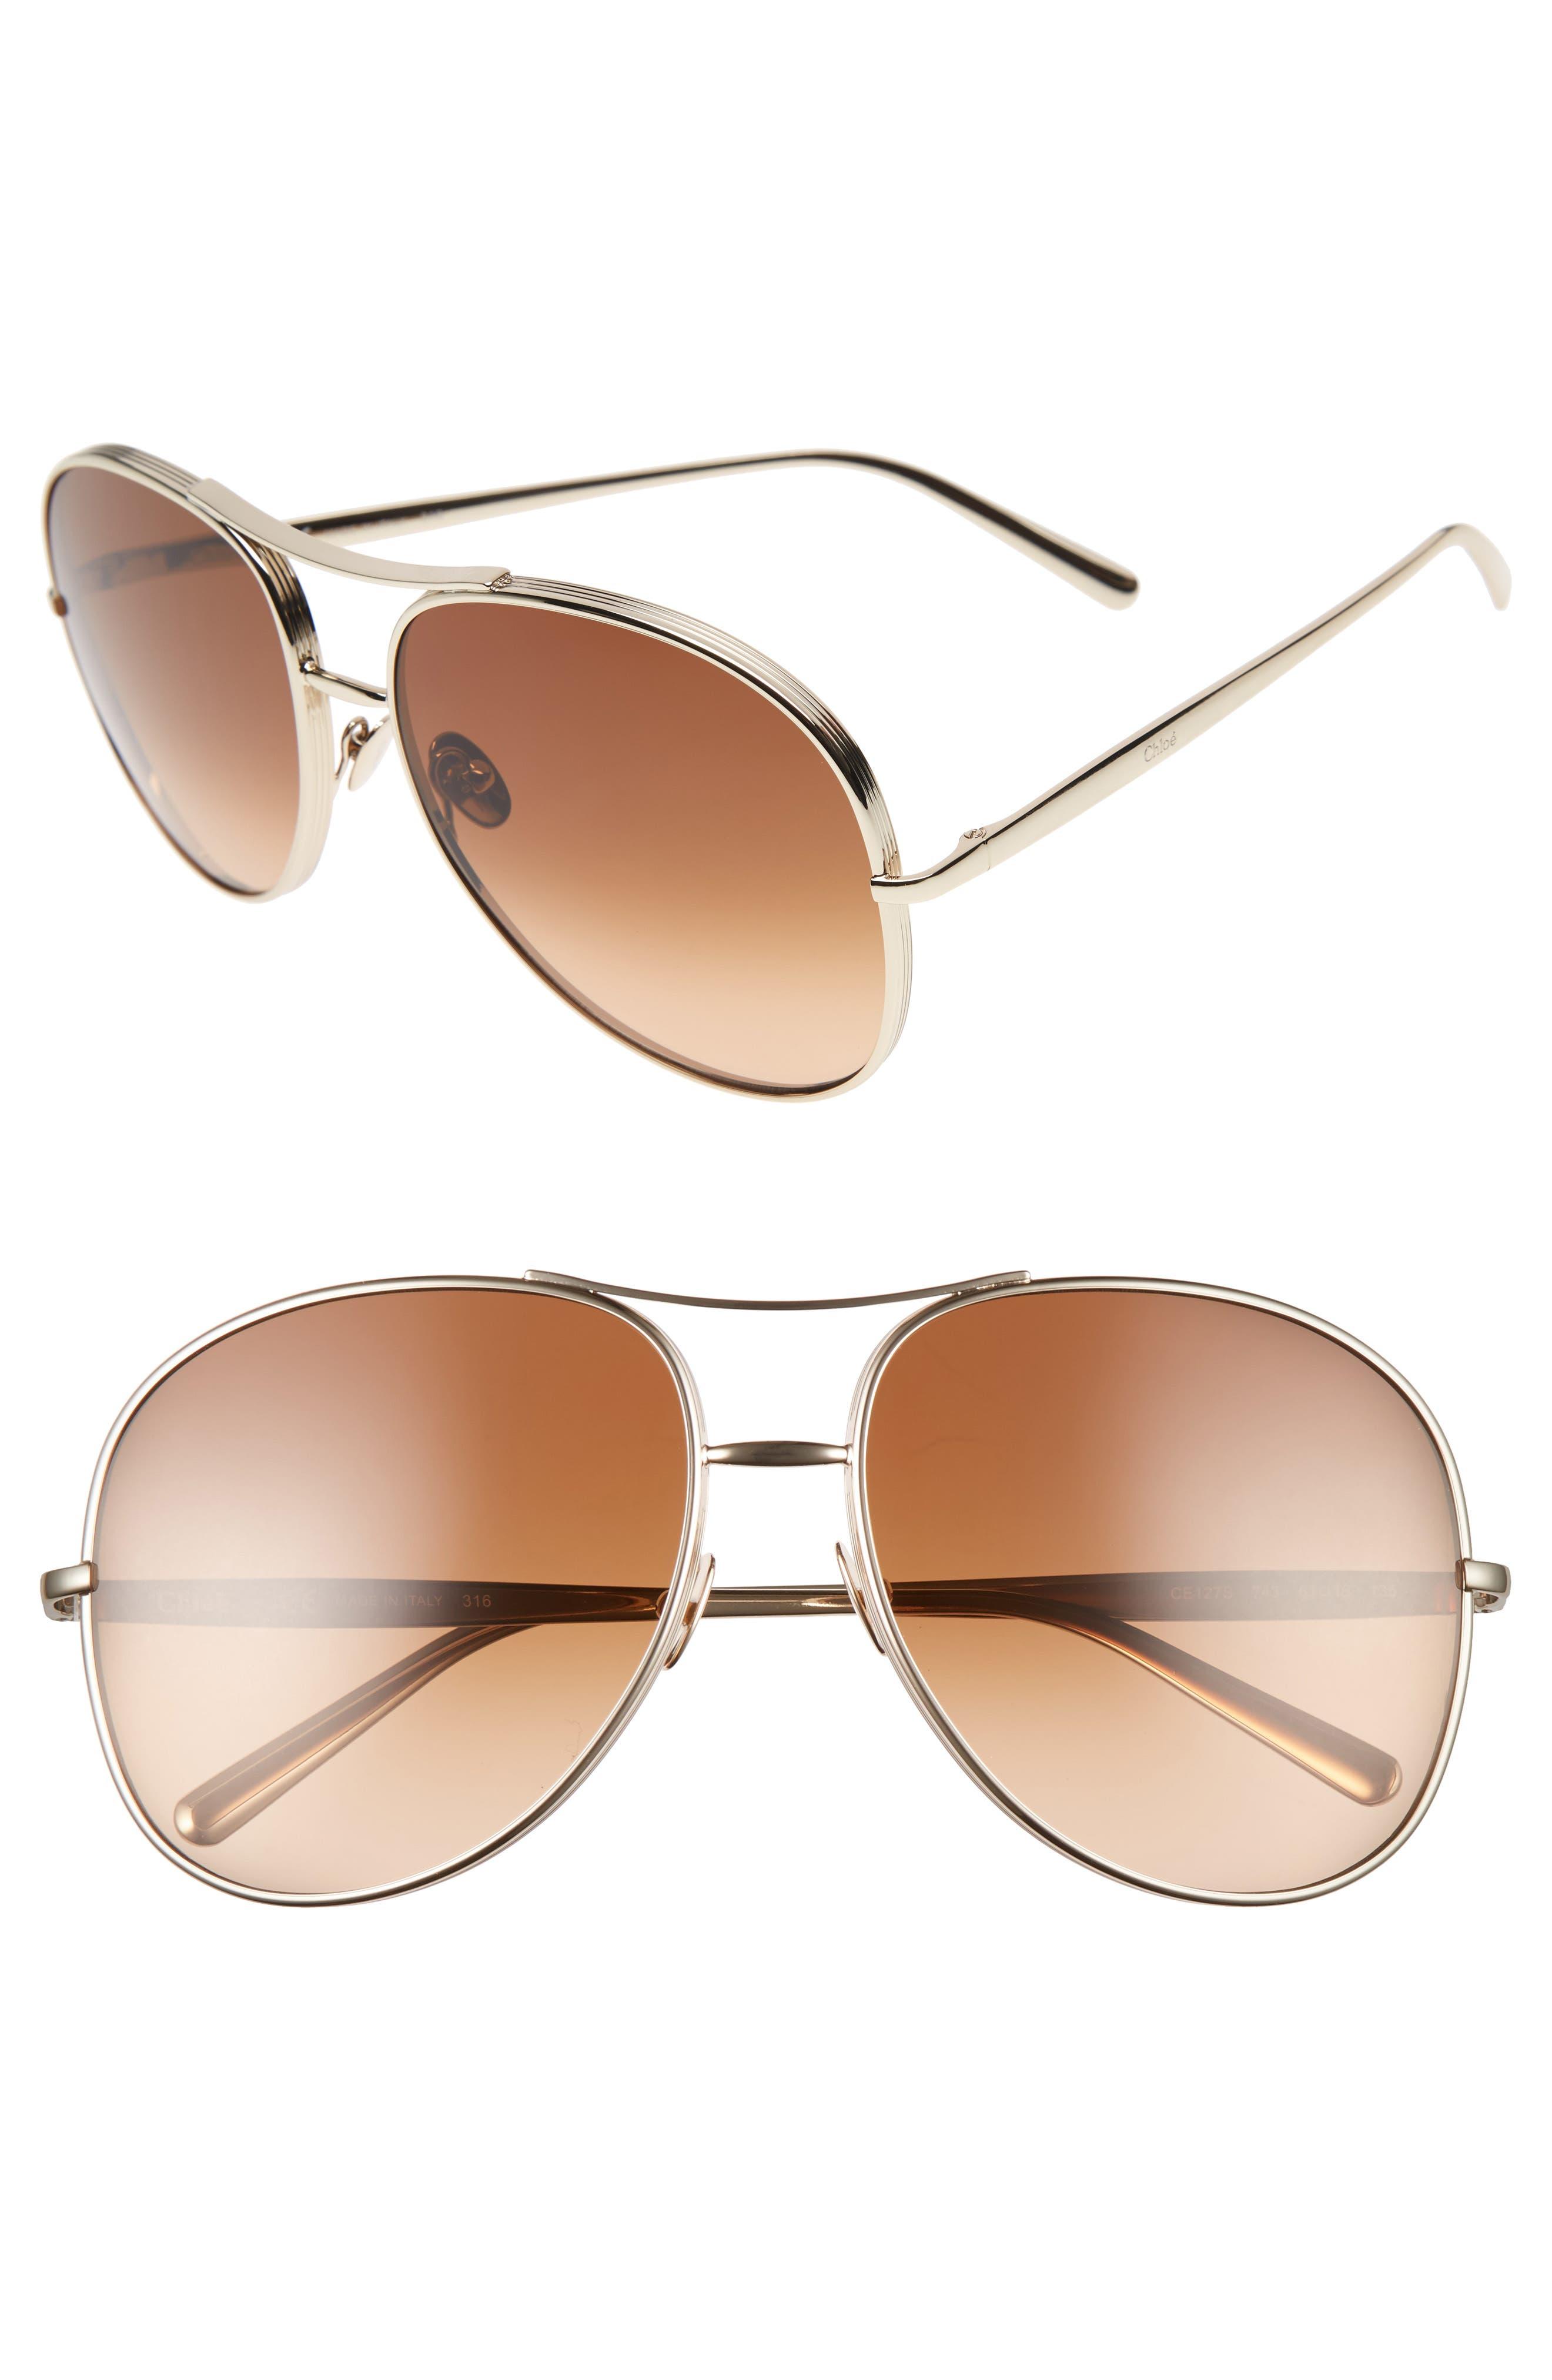 61mm Oversize Sunglasses,                             Main thumbnail 1, color,